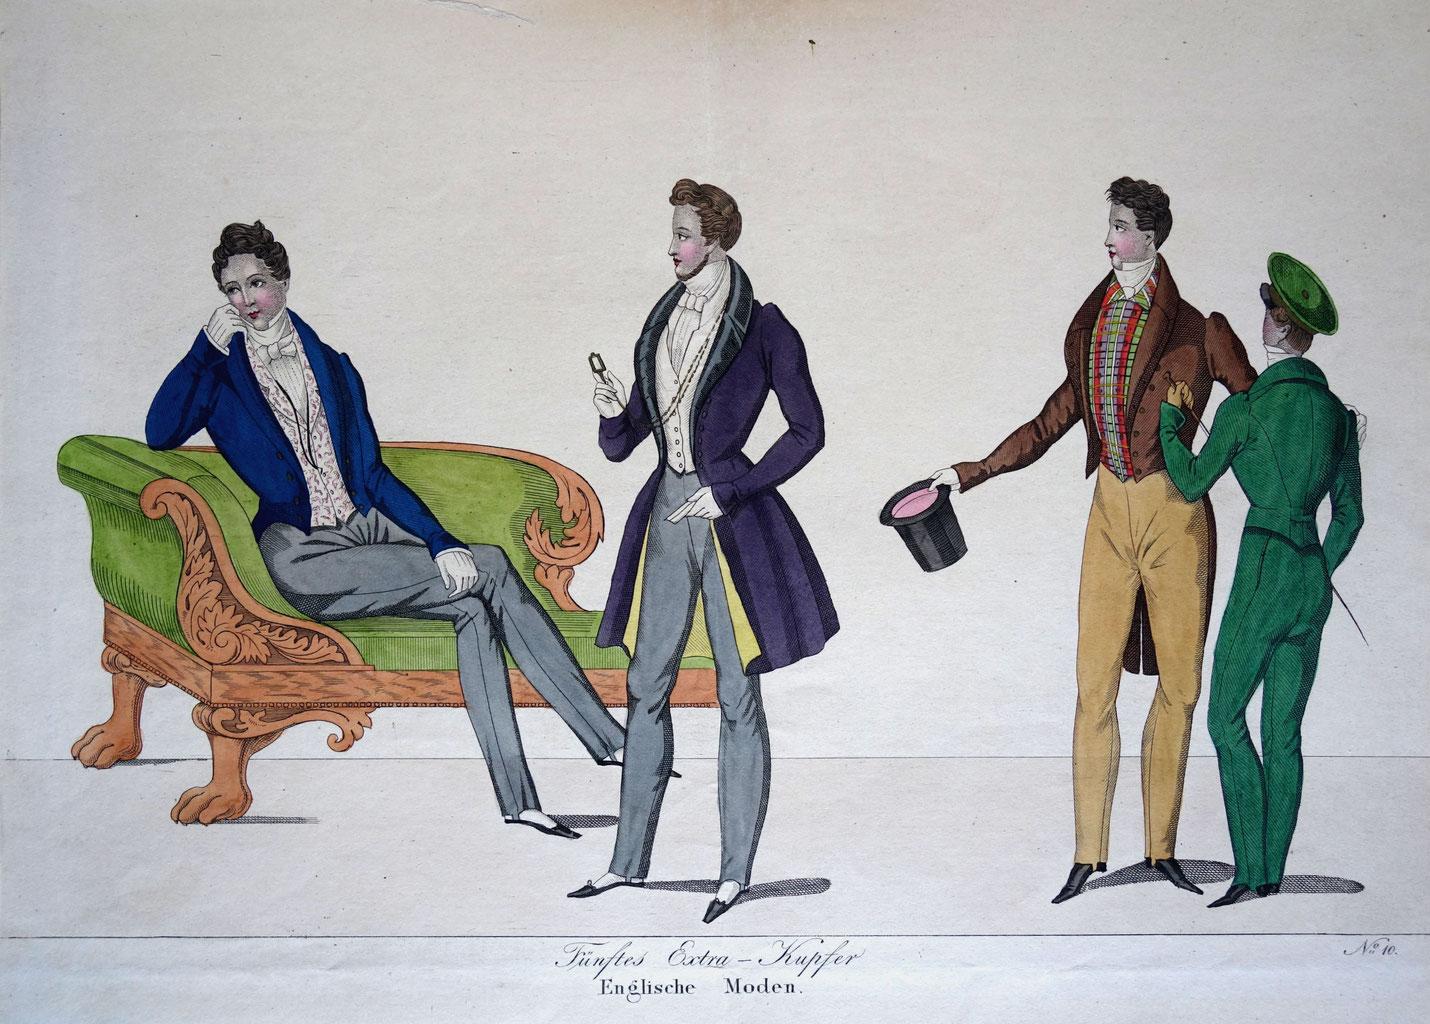 herrenmode des fr hen 19 jahrhunderts epochs of fashion ladies costume through the ages. Black Bedroom Furniture Sets. Home Design Ideas